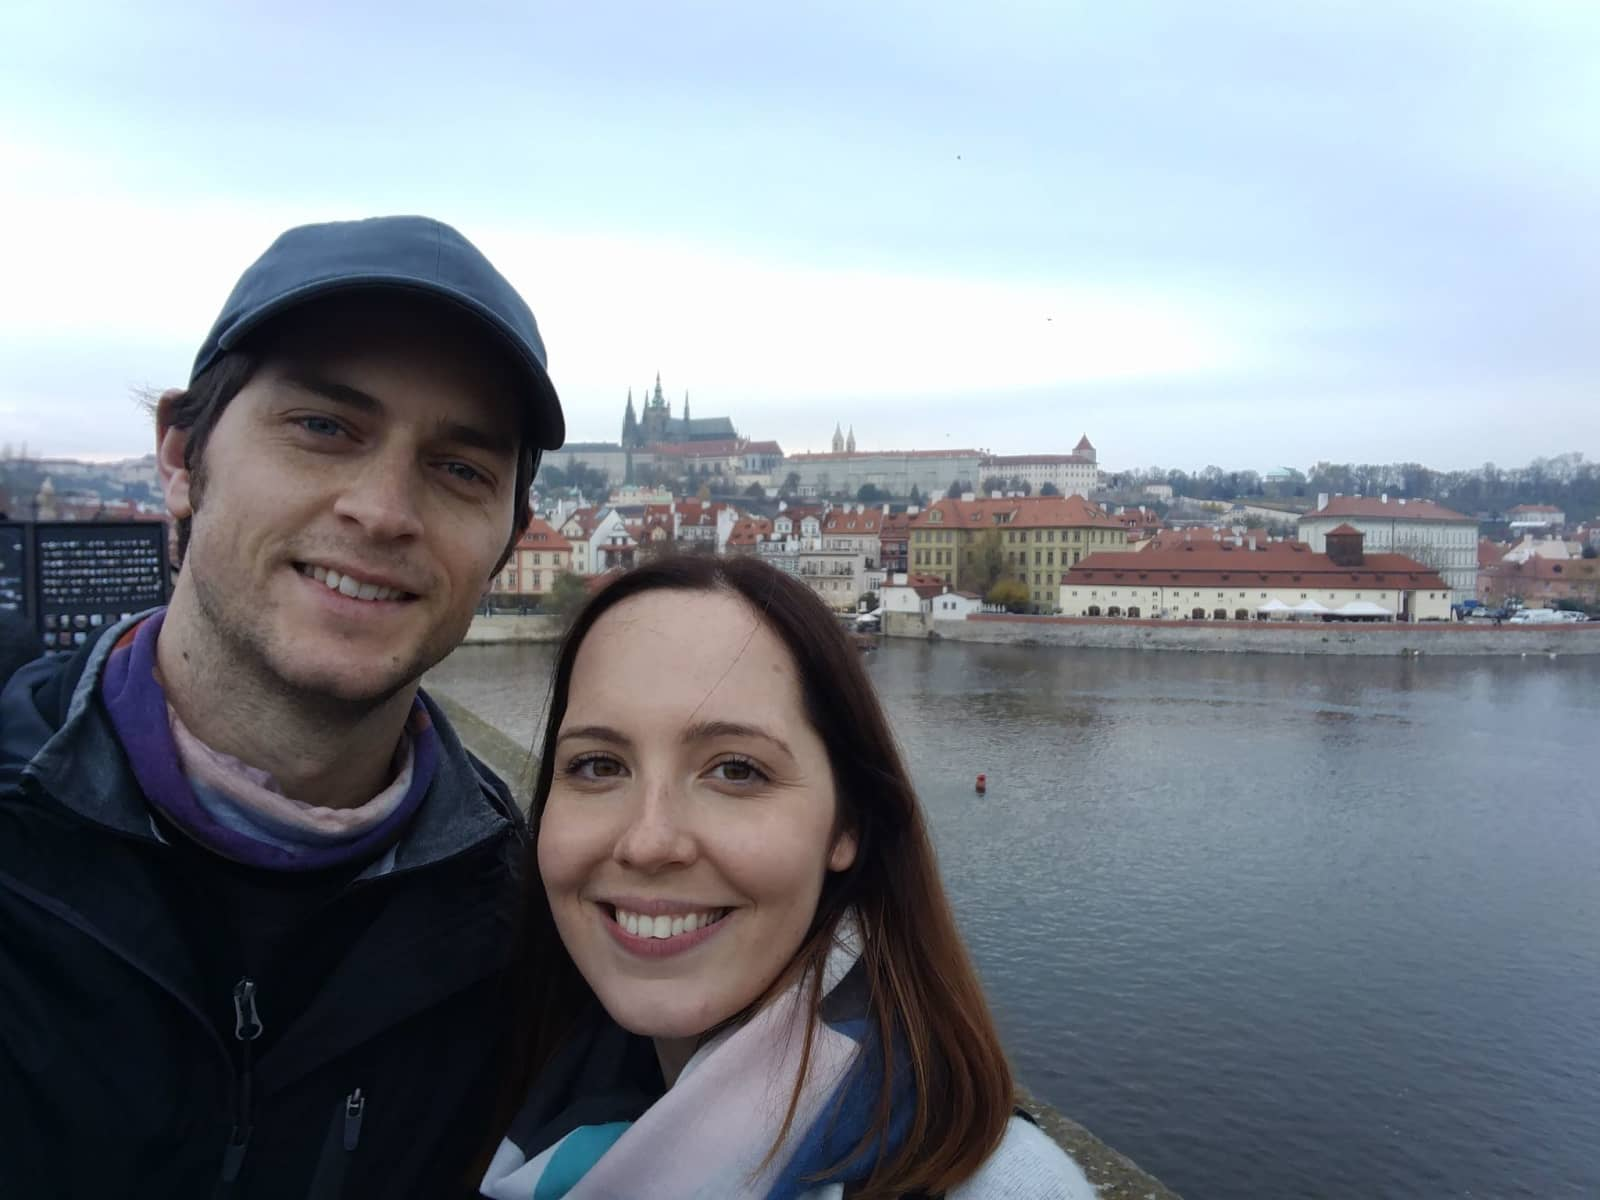 Natalie & Marc from Perth, Western Australia, Australia